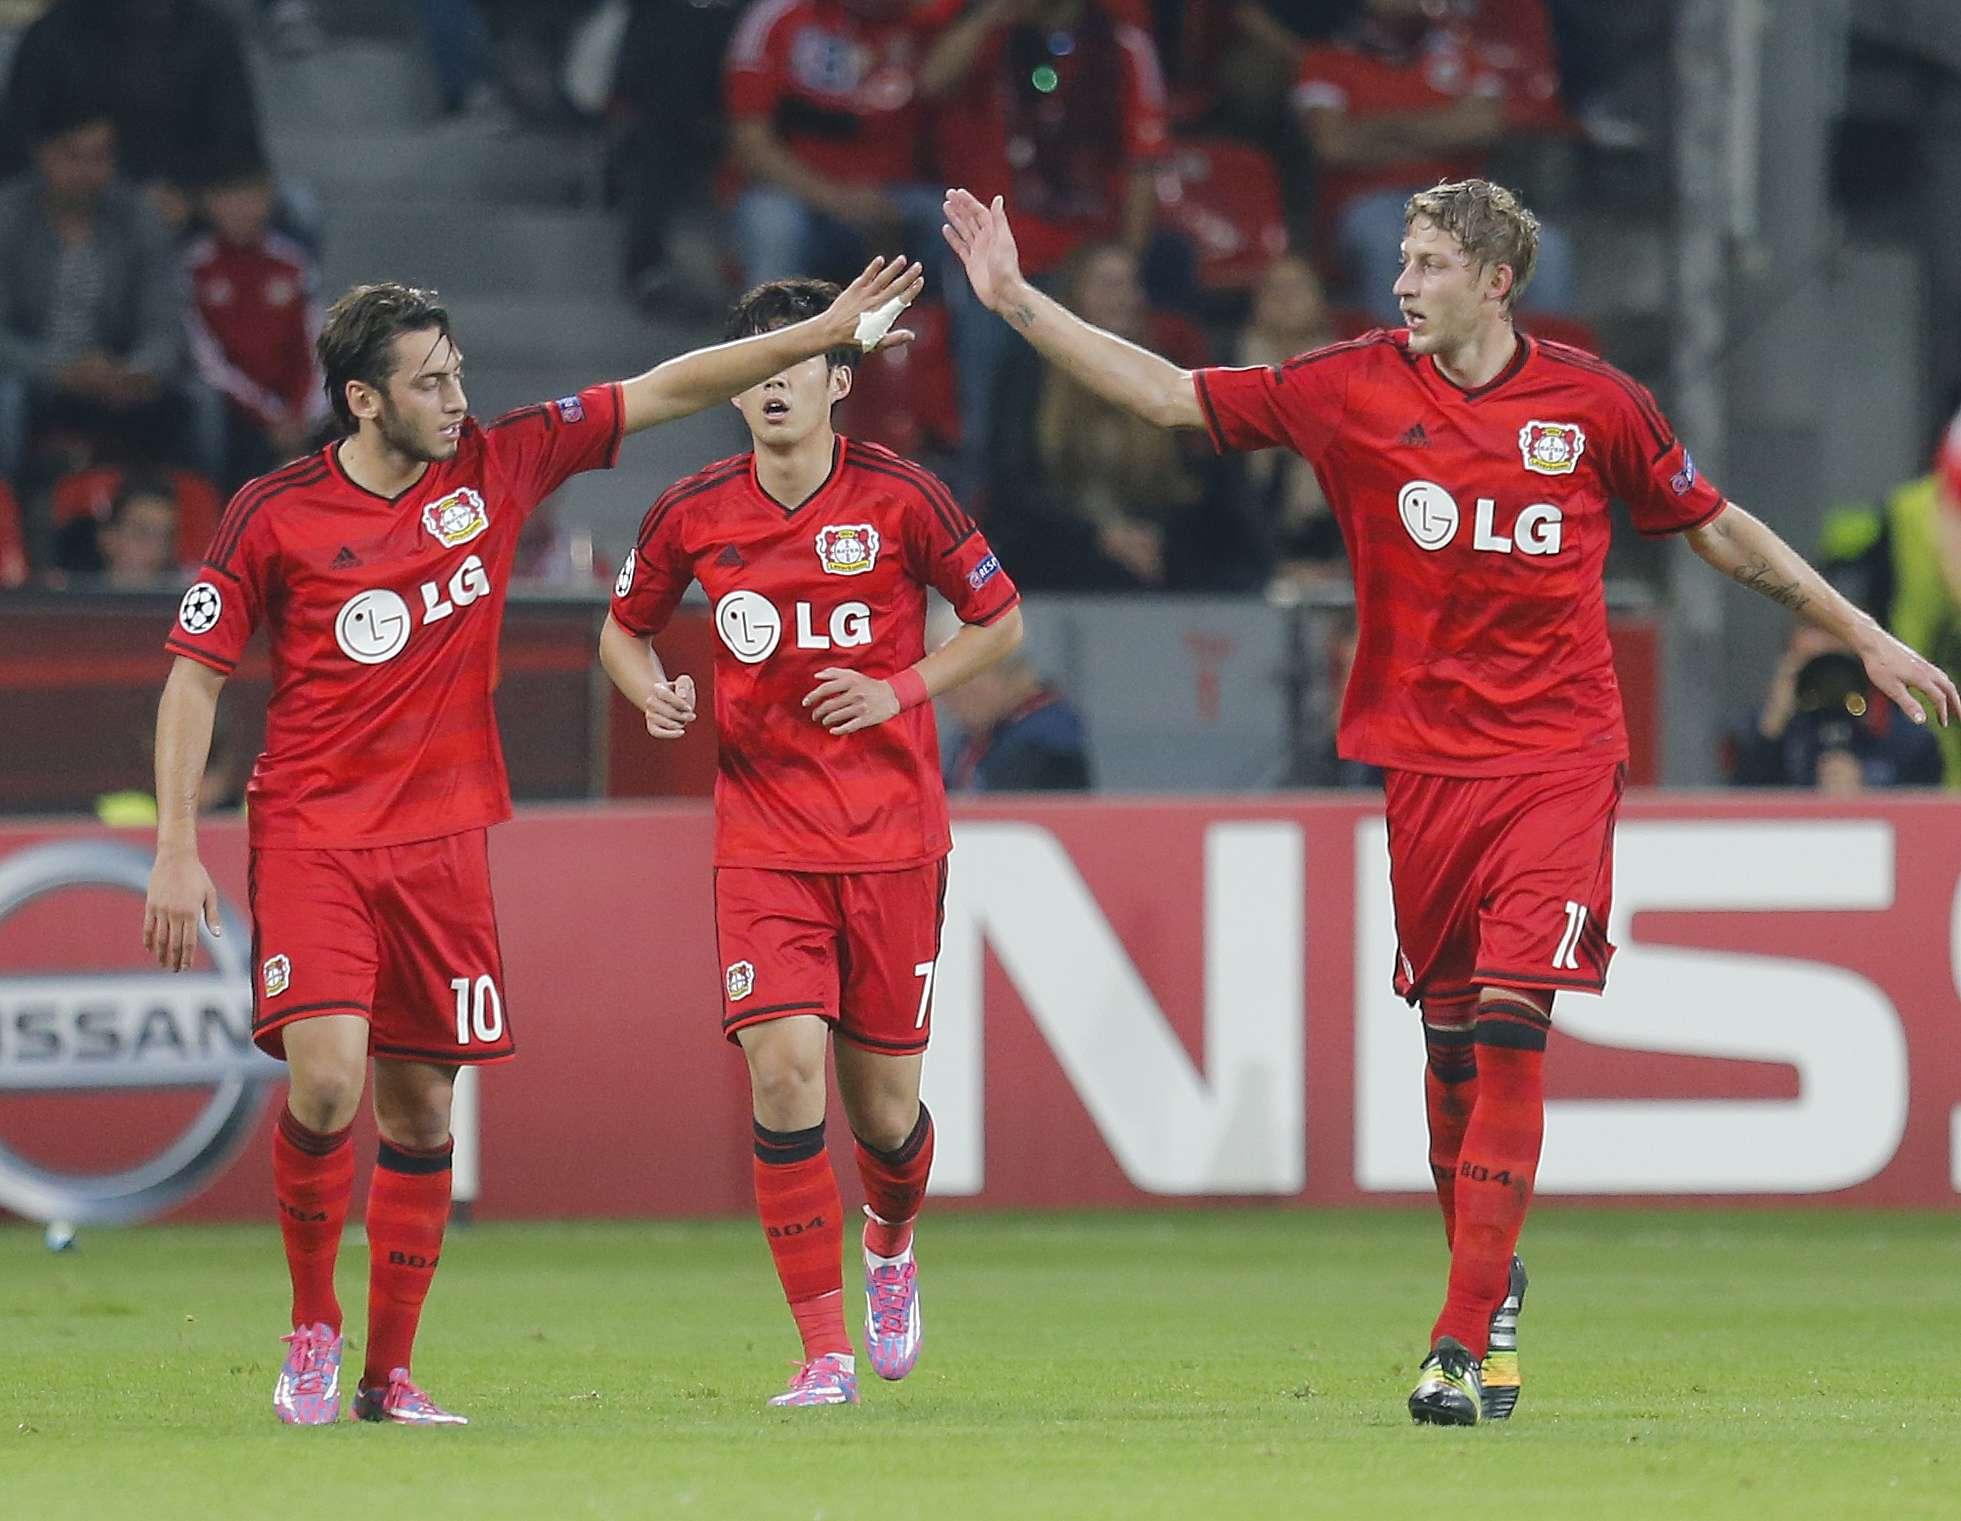 Bayer Leverkusen golea 3-1 al Benfica en Champions League. Foto: AP